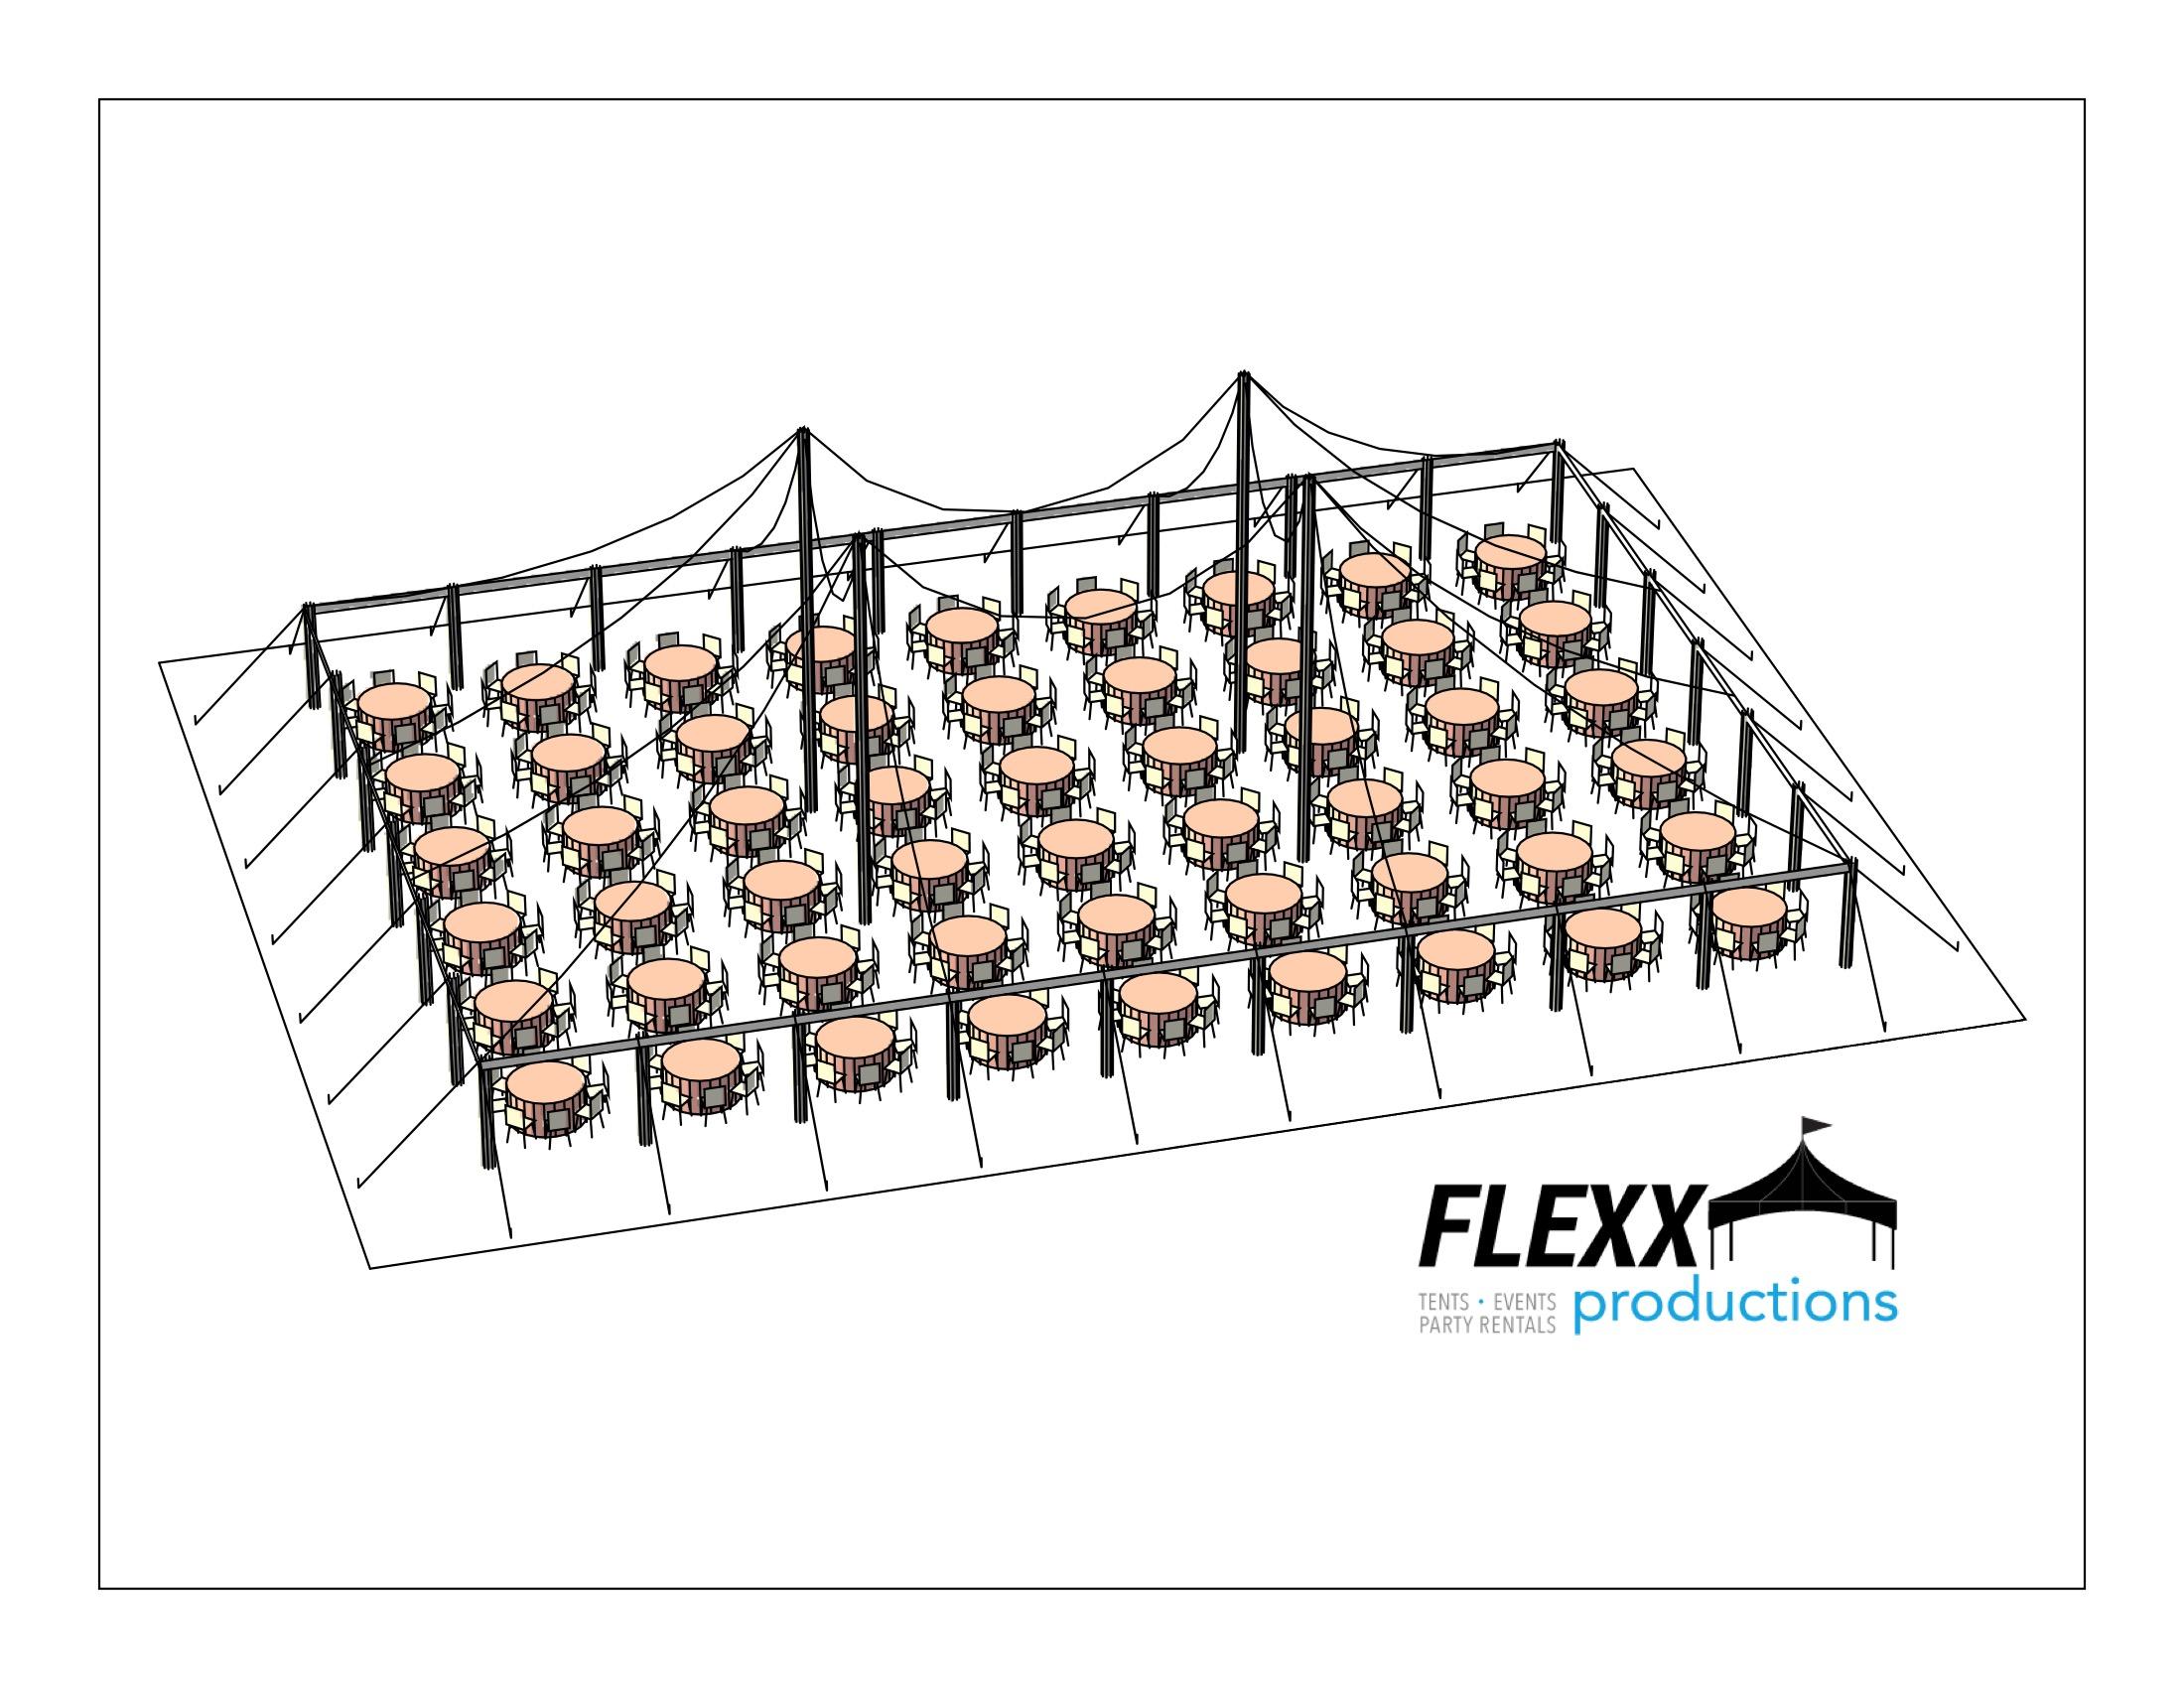 Flexx Productions Pole Tent Layout